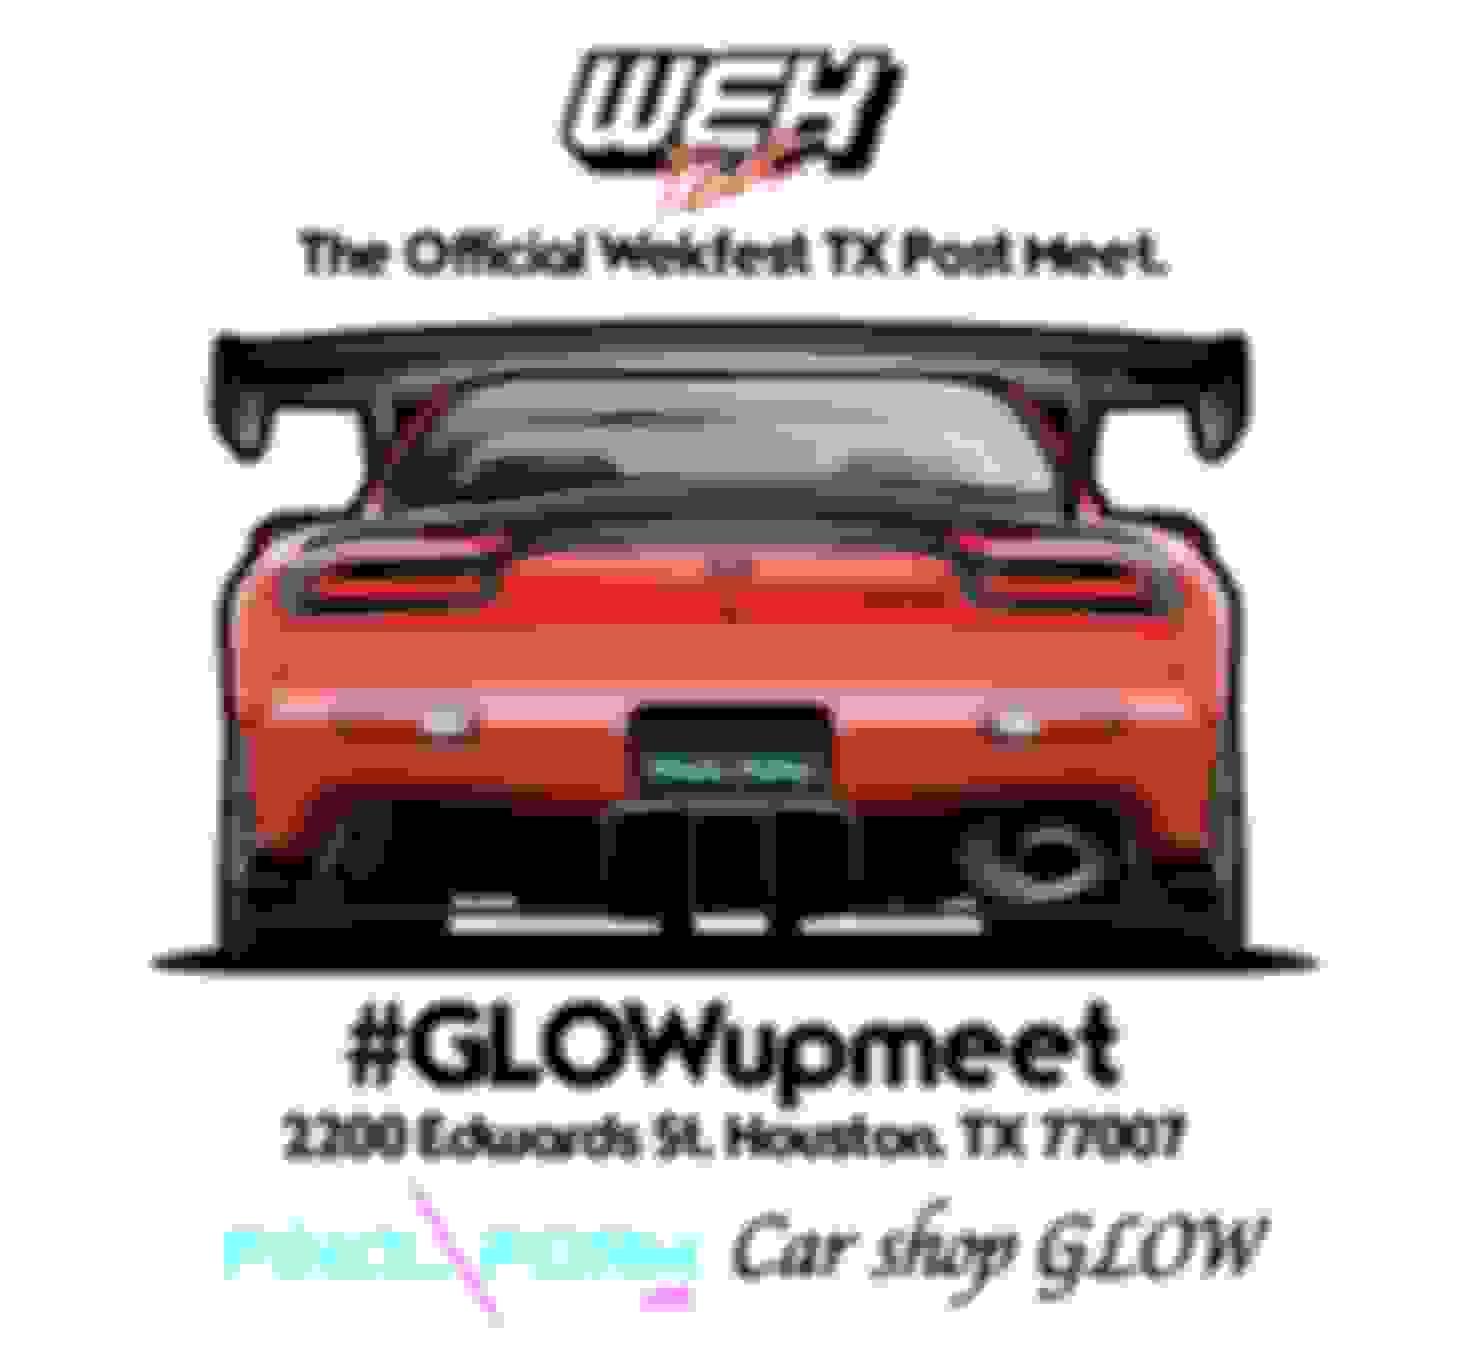 December 3rd Car Shop Glow X Wekfest Tx Glowupmeet Rx7club Com